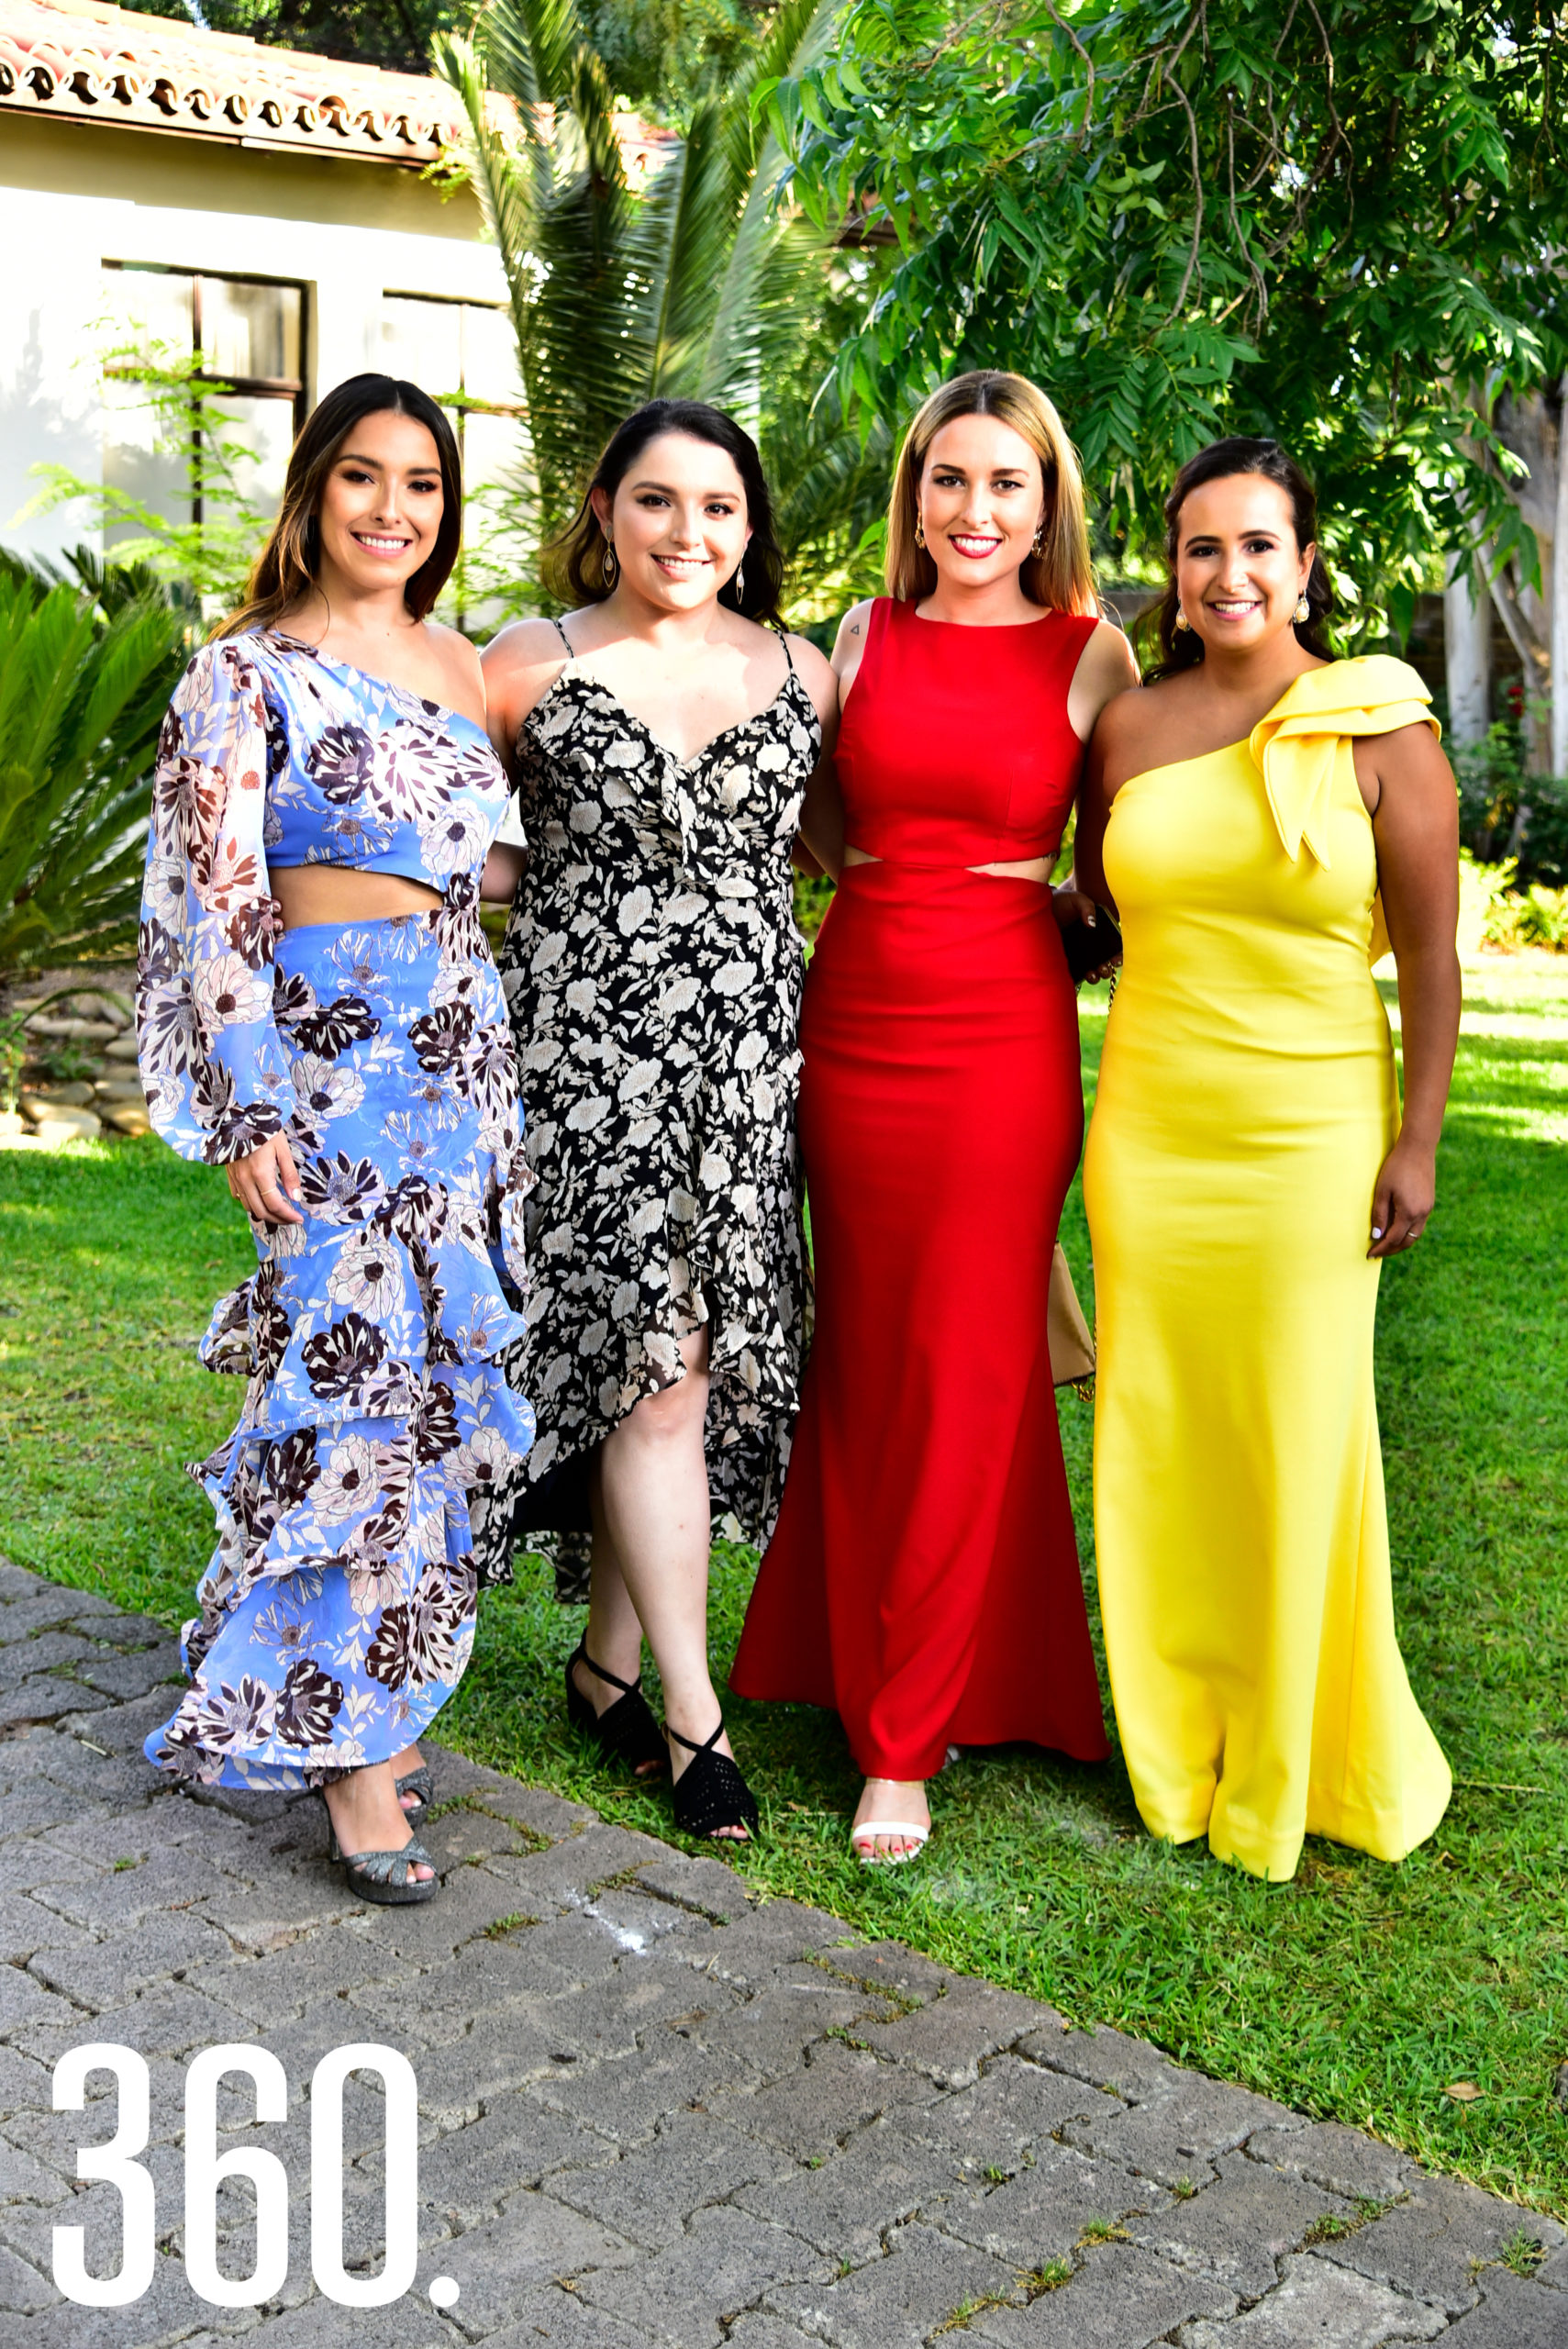 Paty Alvarado, Paola Alvarado, Valeria Betancourt y Martha Dainitin.